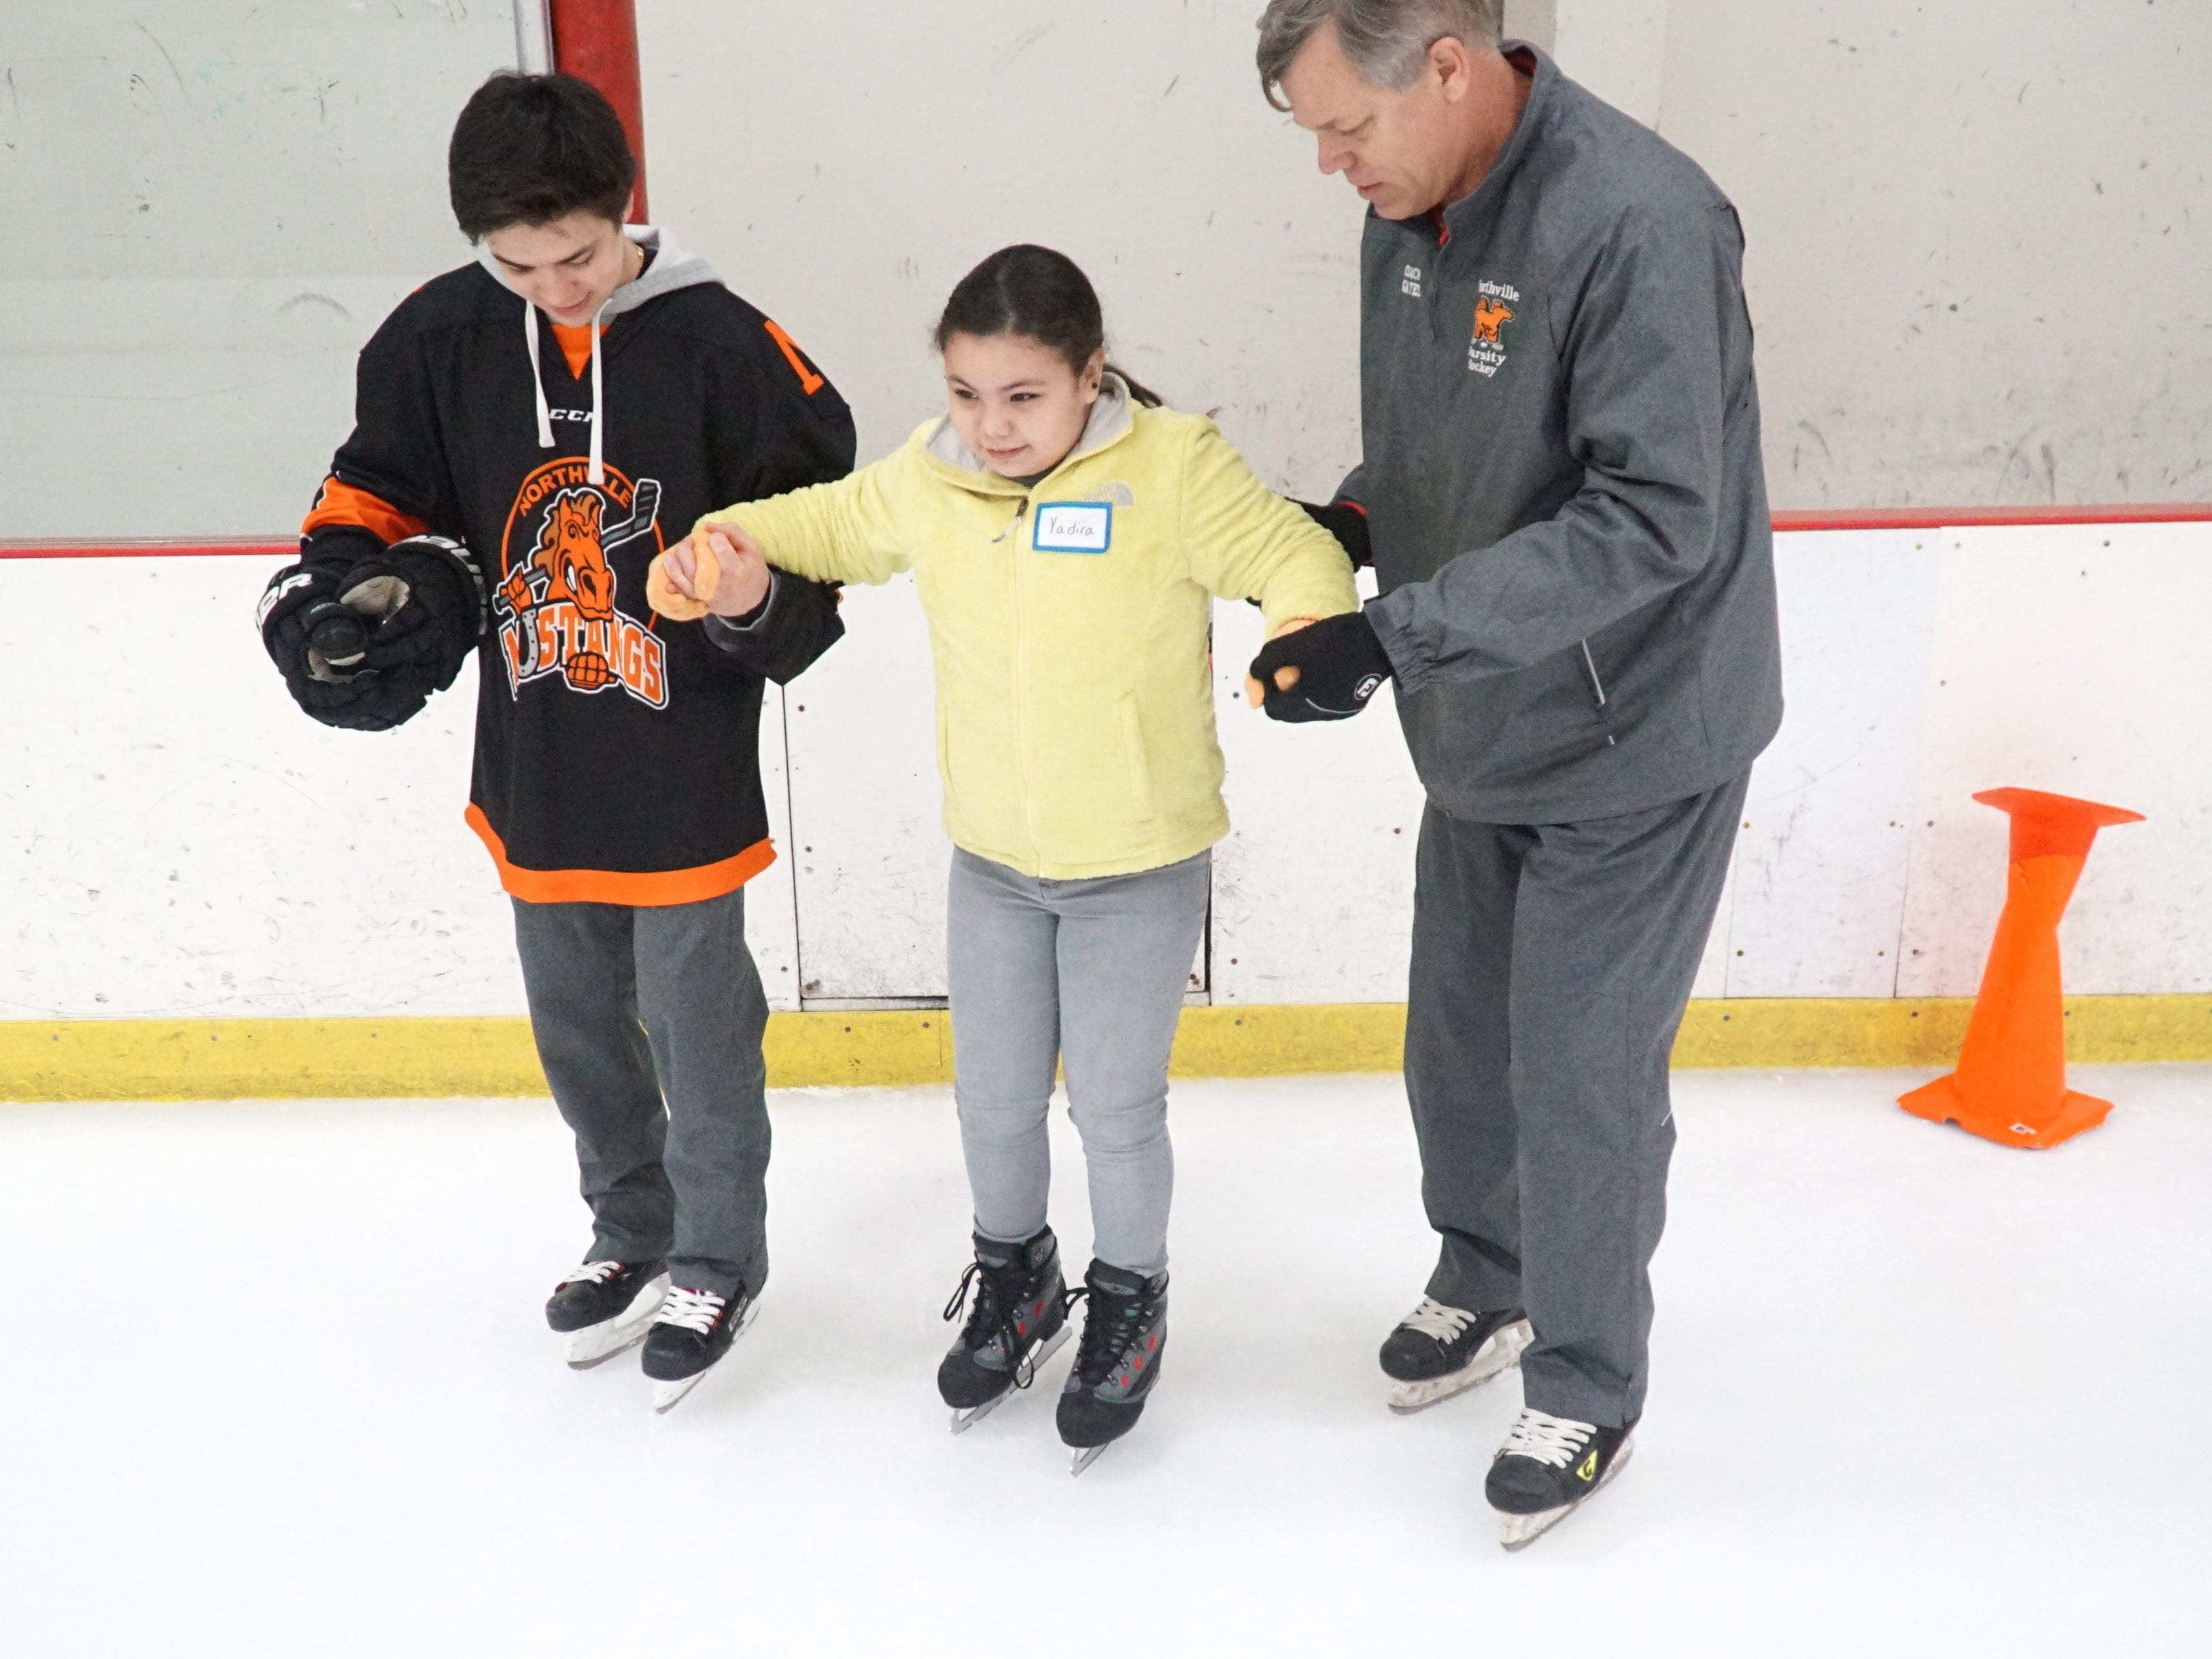 Northville High School varsity hockey coach John Gates and Mustang Derek Fiebig help Neinas Elementary visitor Yadira Hernandez, center, around the ice on Feb. 13.